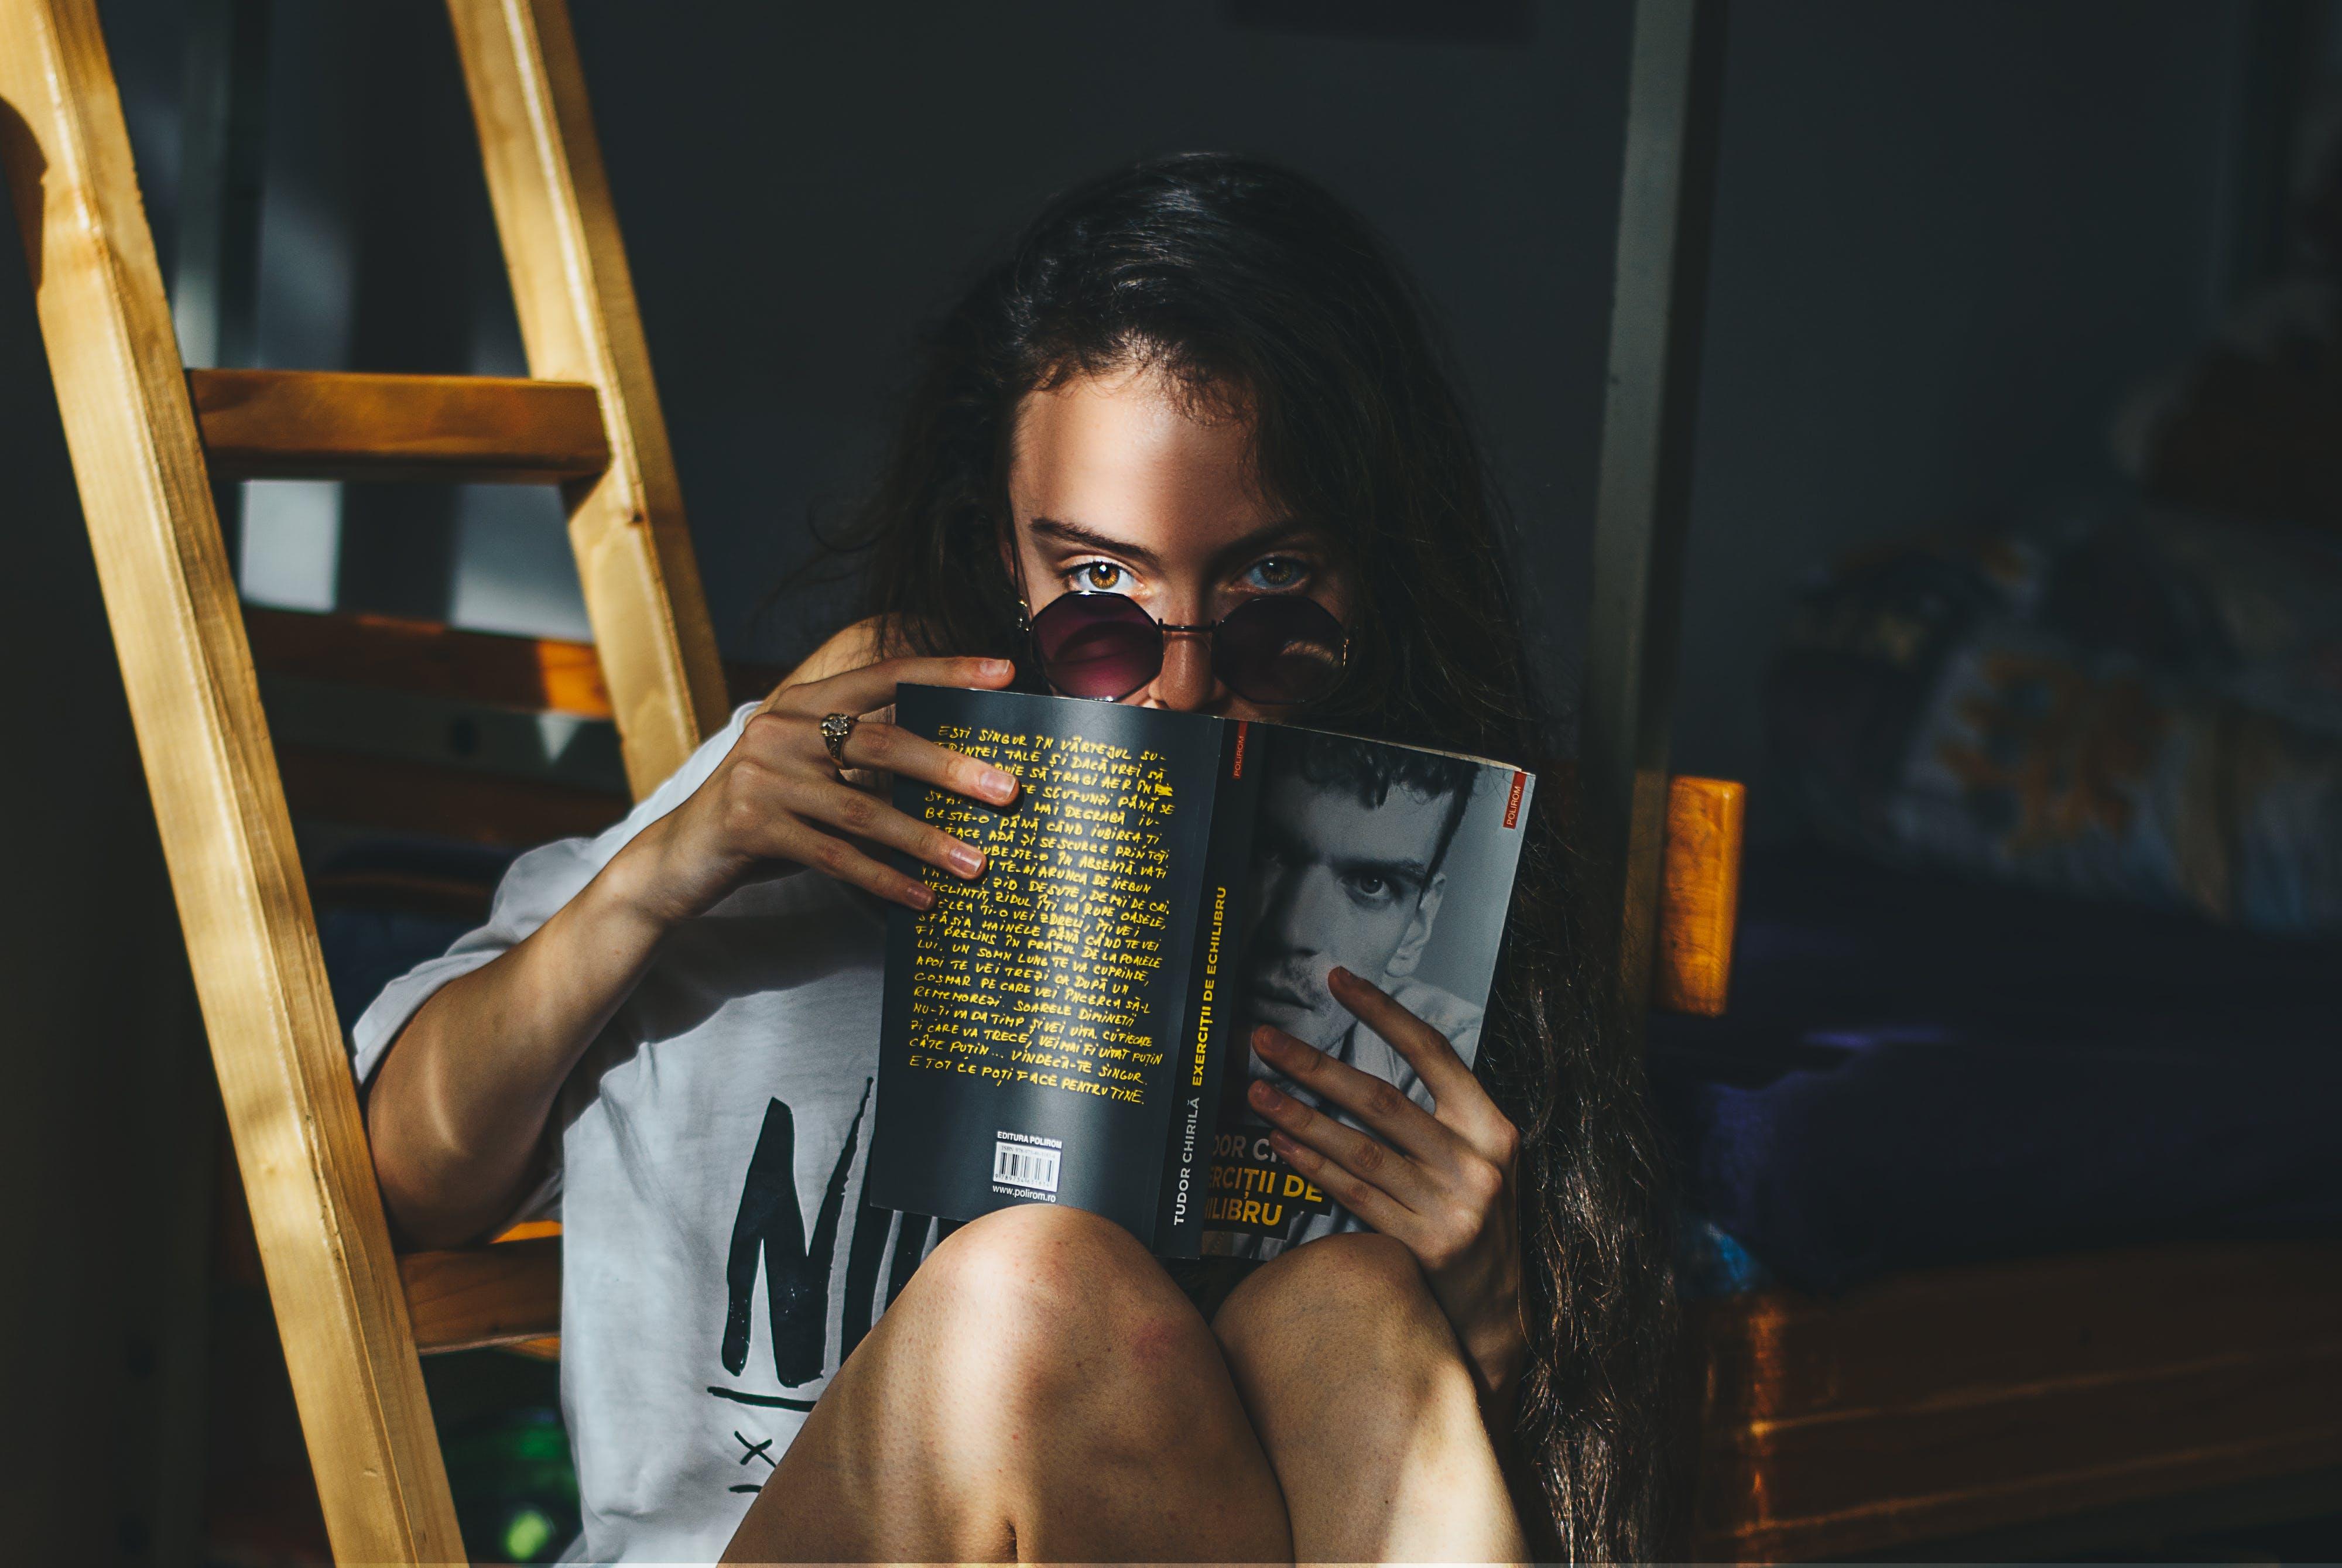 Woman Reading Magazine Beside Brown Wooden Ladder